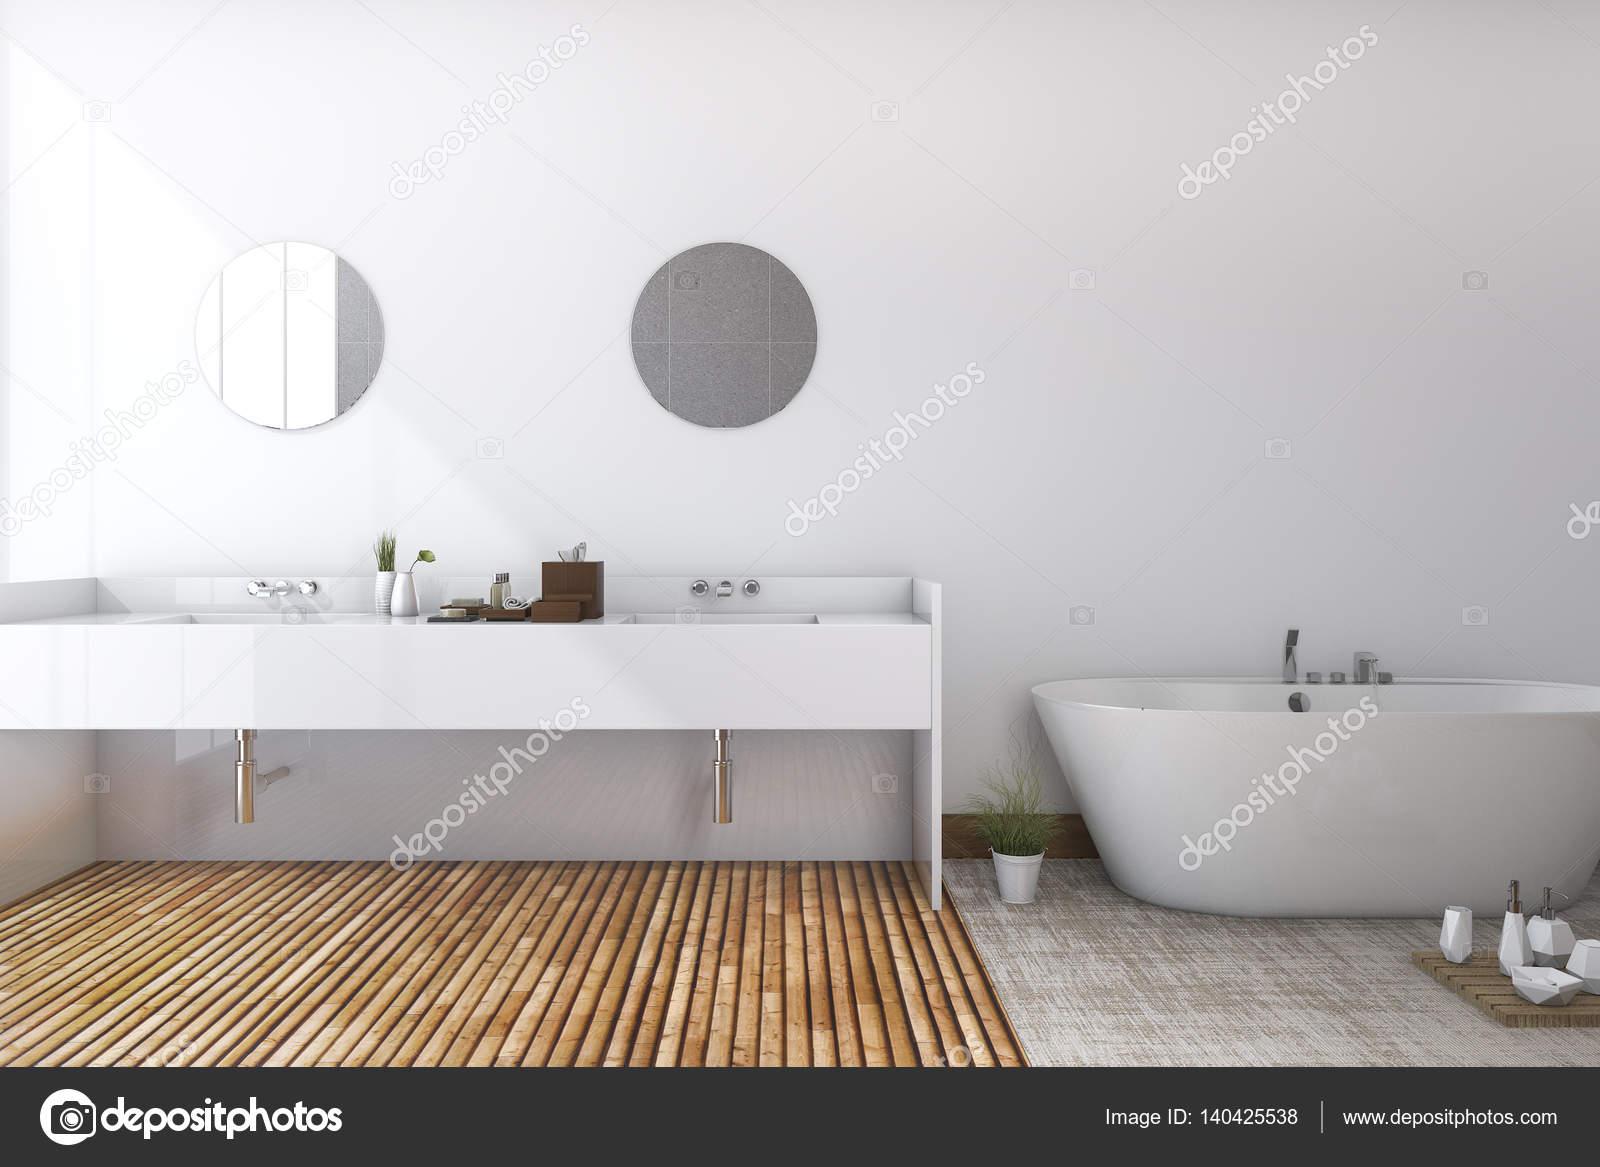 Houten Vloer Badkamer : 3d rendering witte minimale toilet en badkamer met houten vloer